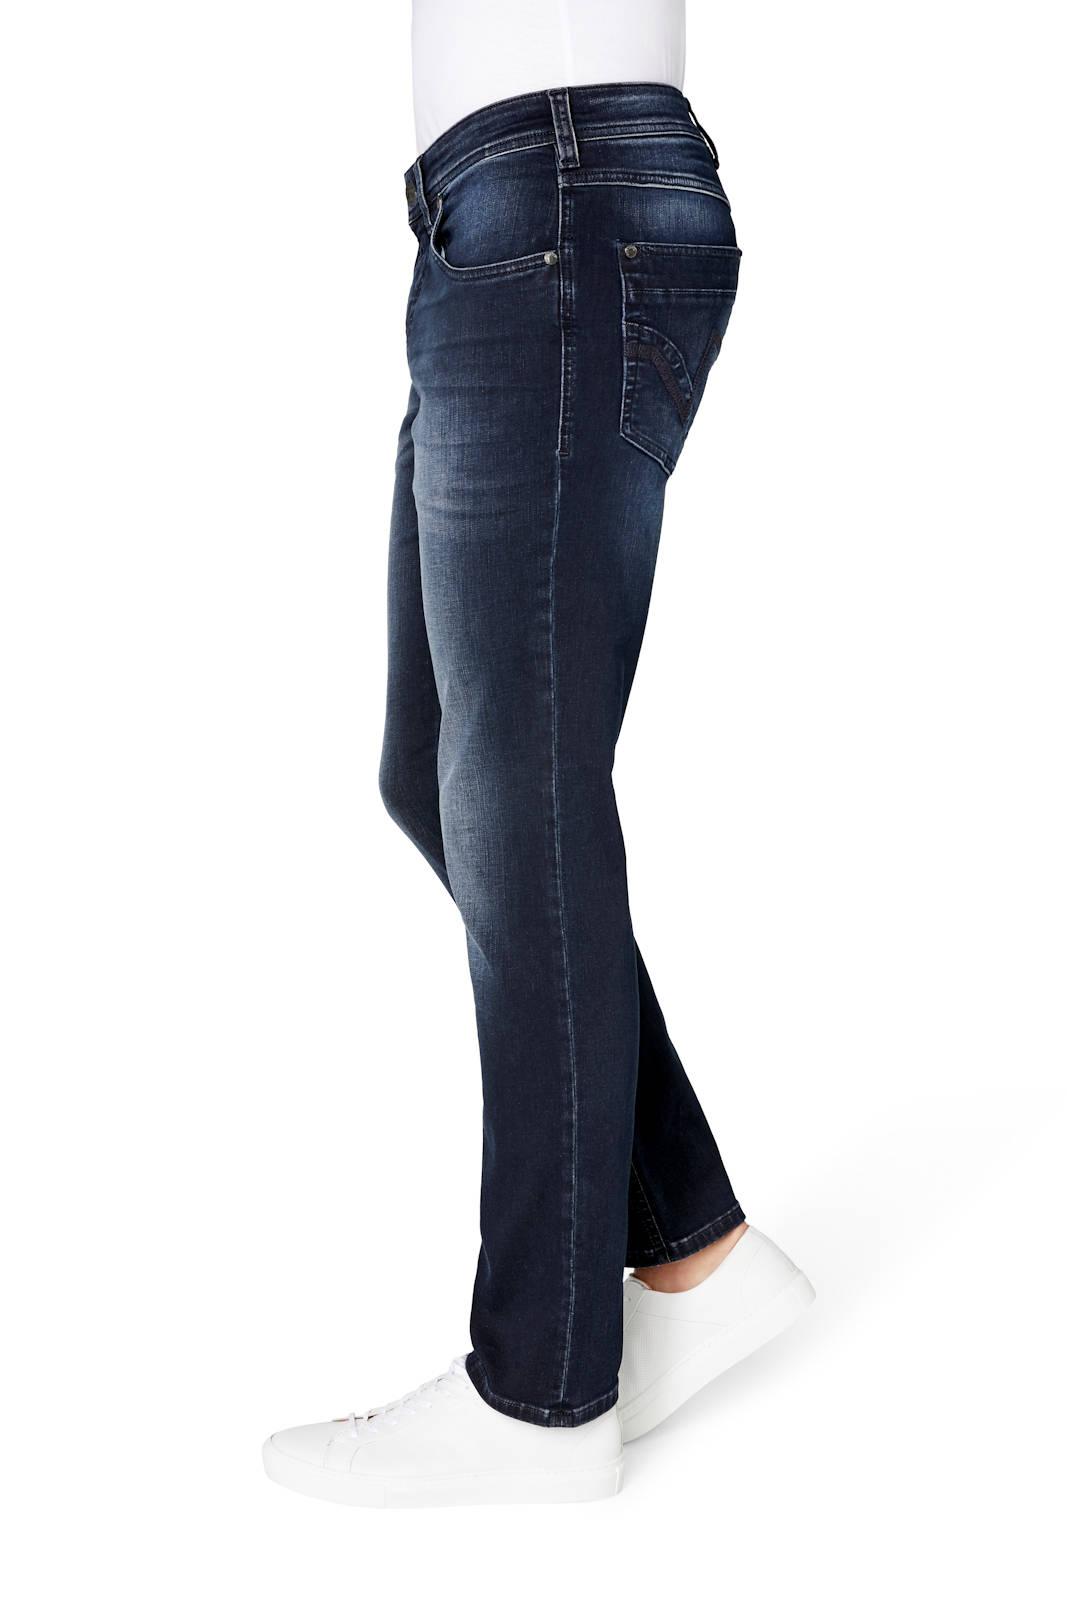 Atelier-GARDEUR-Jeans-BILL-8-Modern-Fit-Herren-Hose-Slim-Leg-Denim-NEU Indexbild 11